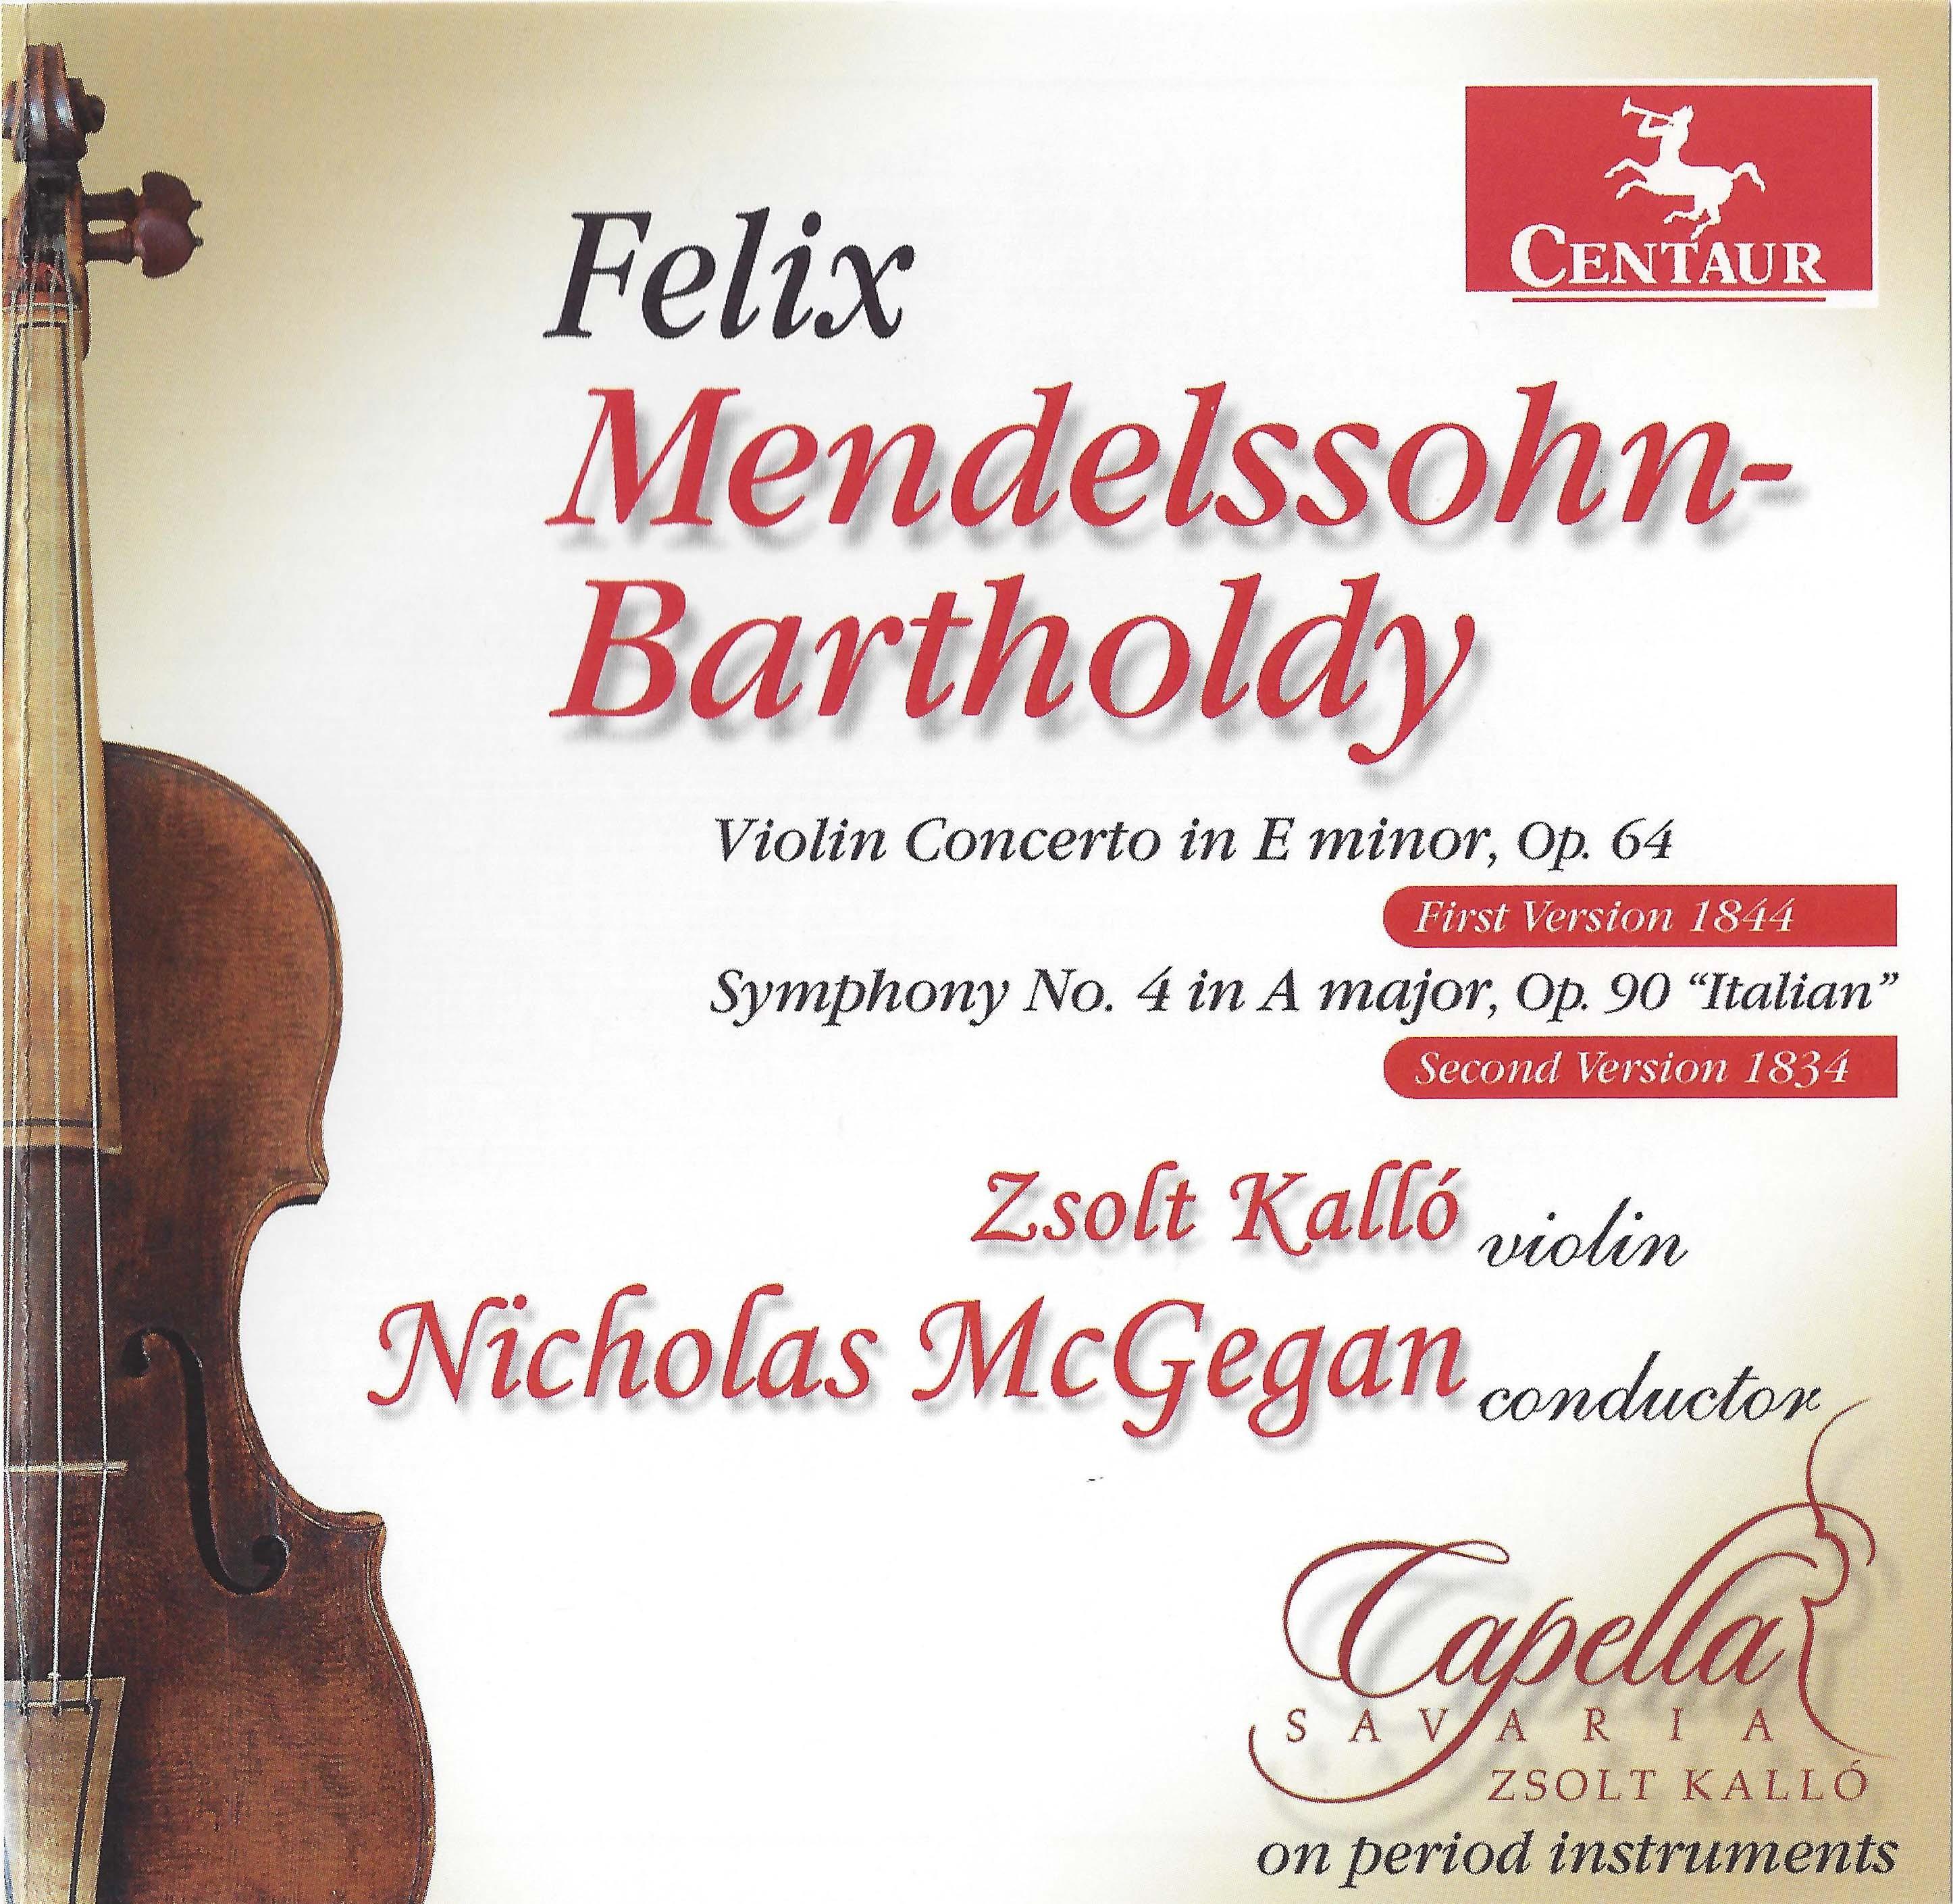 CRC 3287 Felix Mendelssohn-Bartholdy